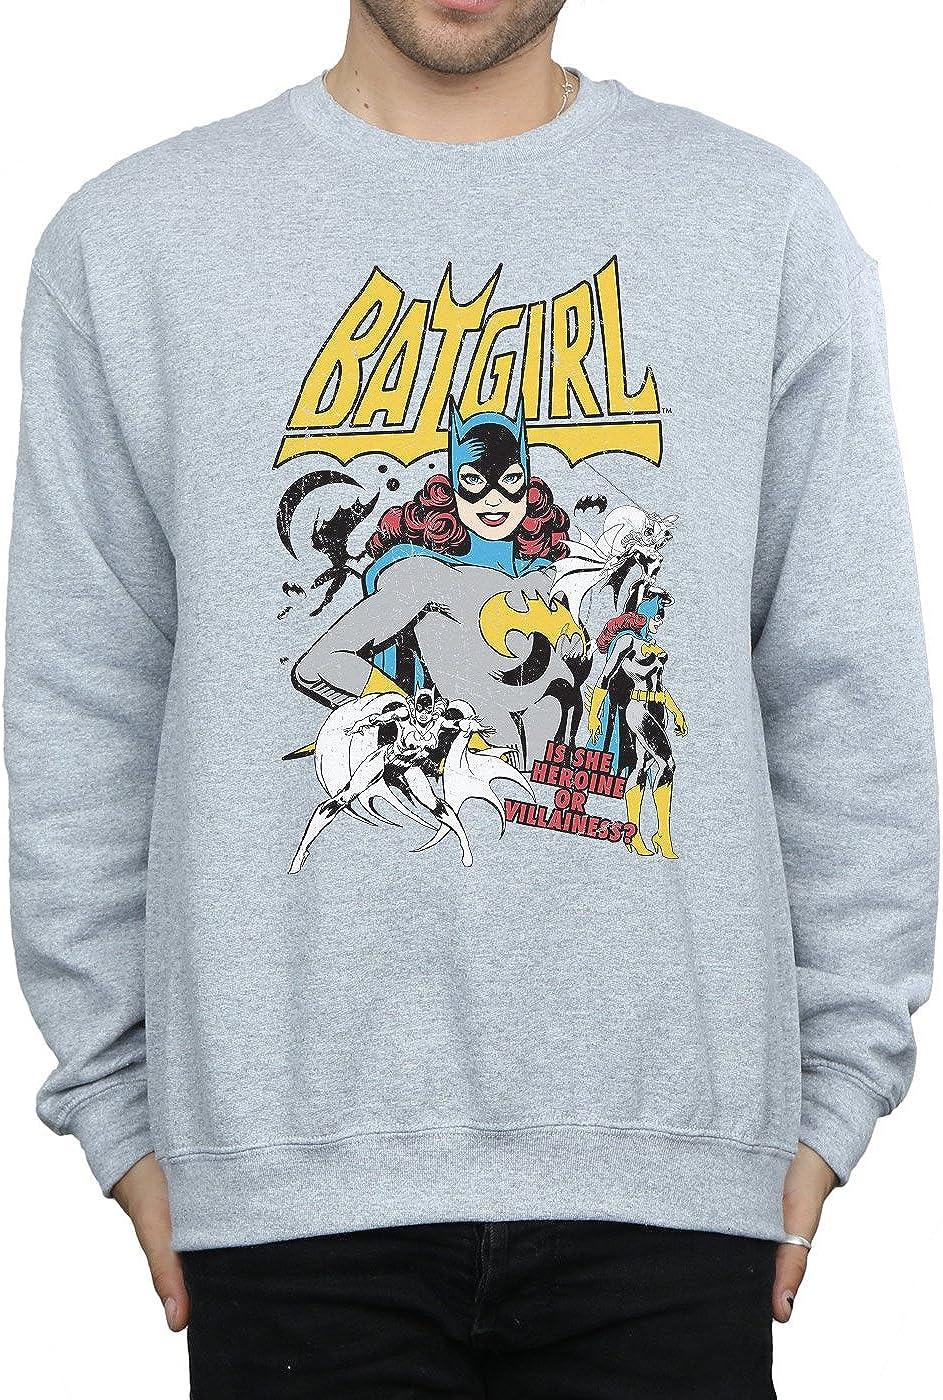 DC Comic Homme Batgirl Heroine Or Villainess Sweat-Shirt Sport Gris